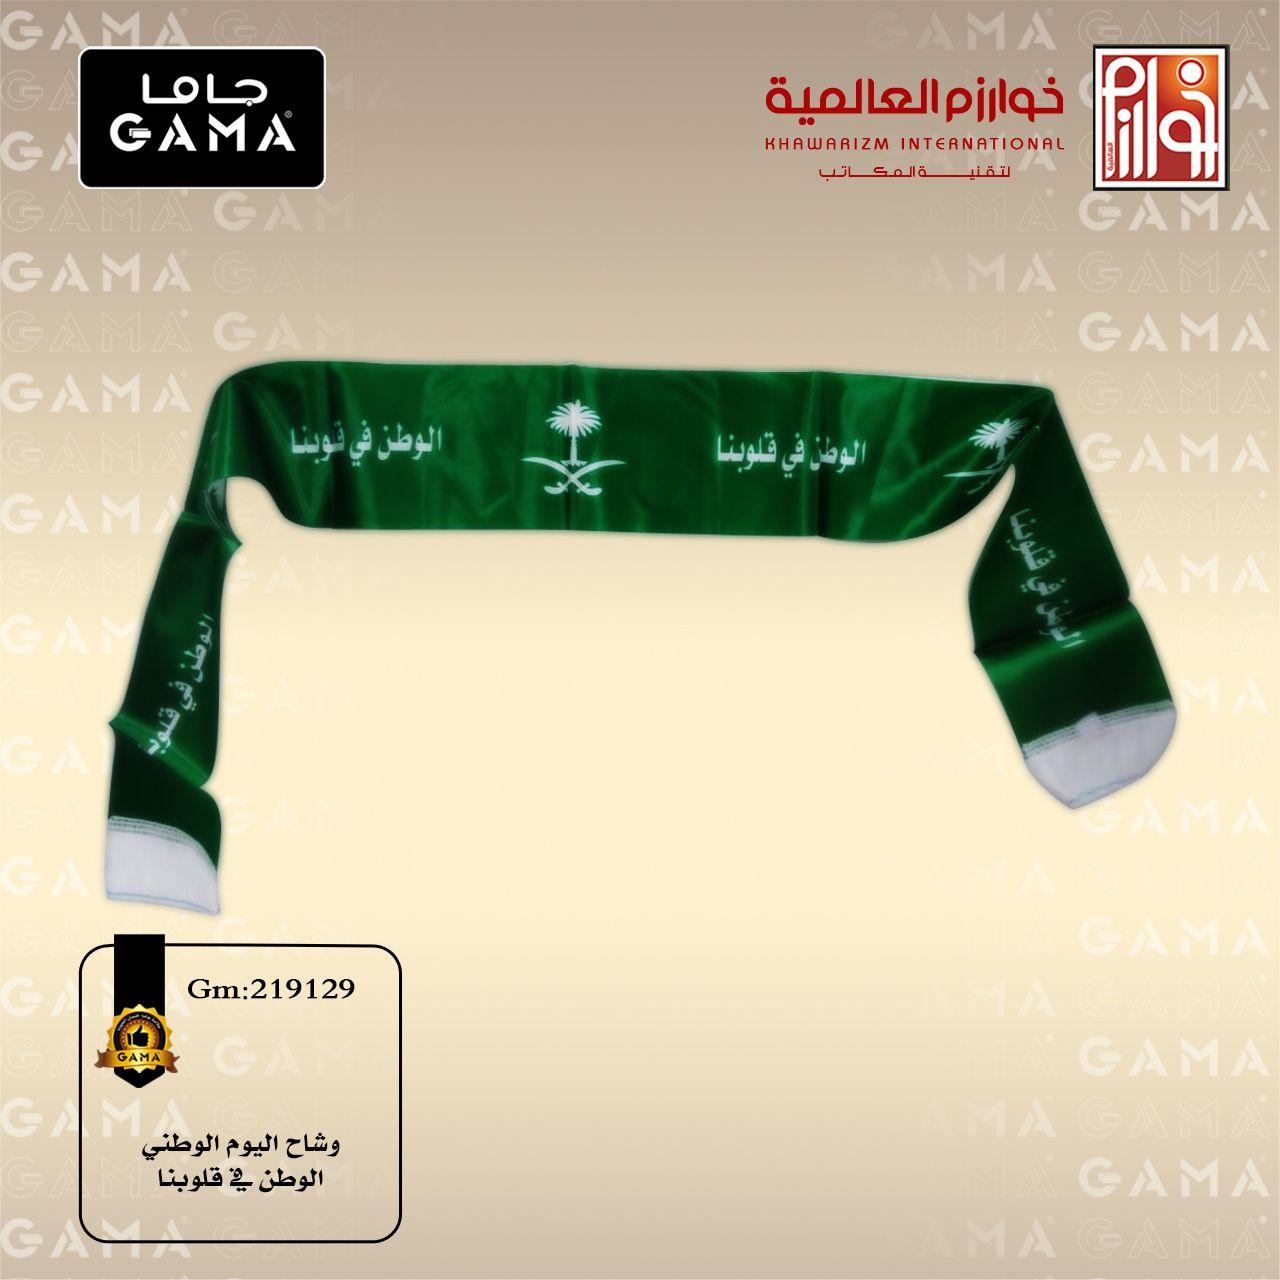 وشاح اليوم الوطني السعودي Stationery Bags Duffle